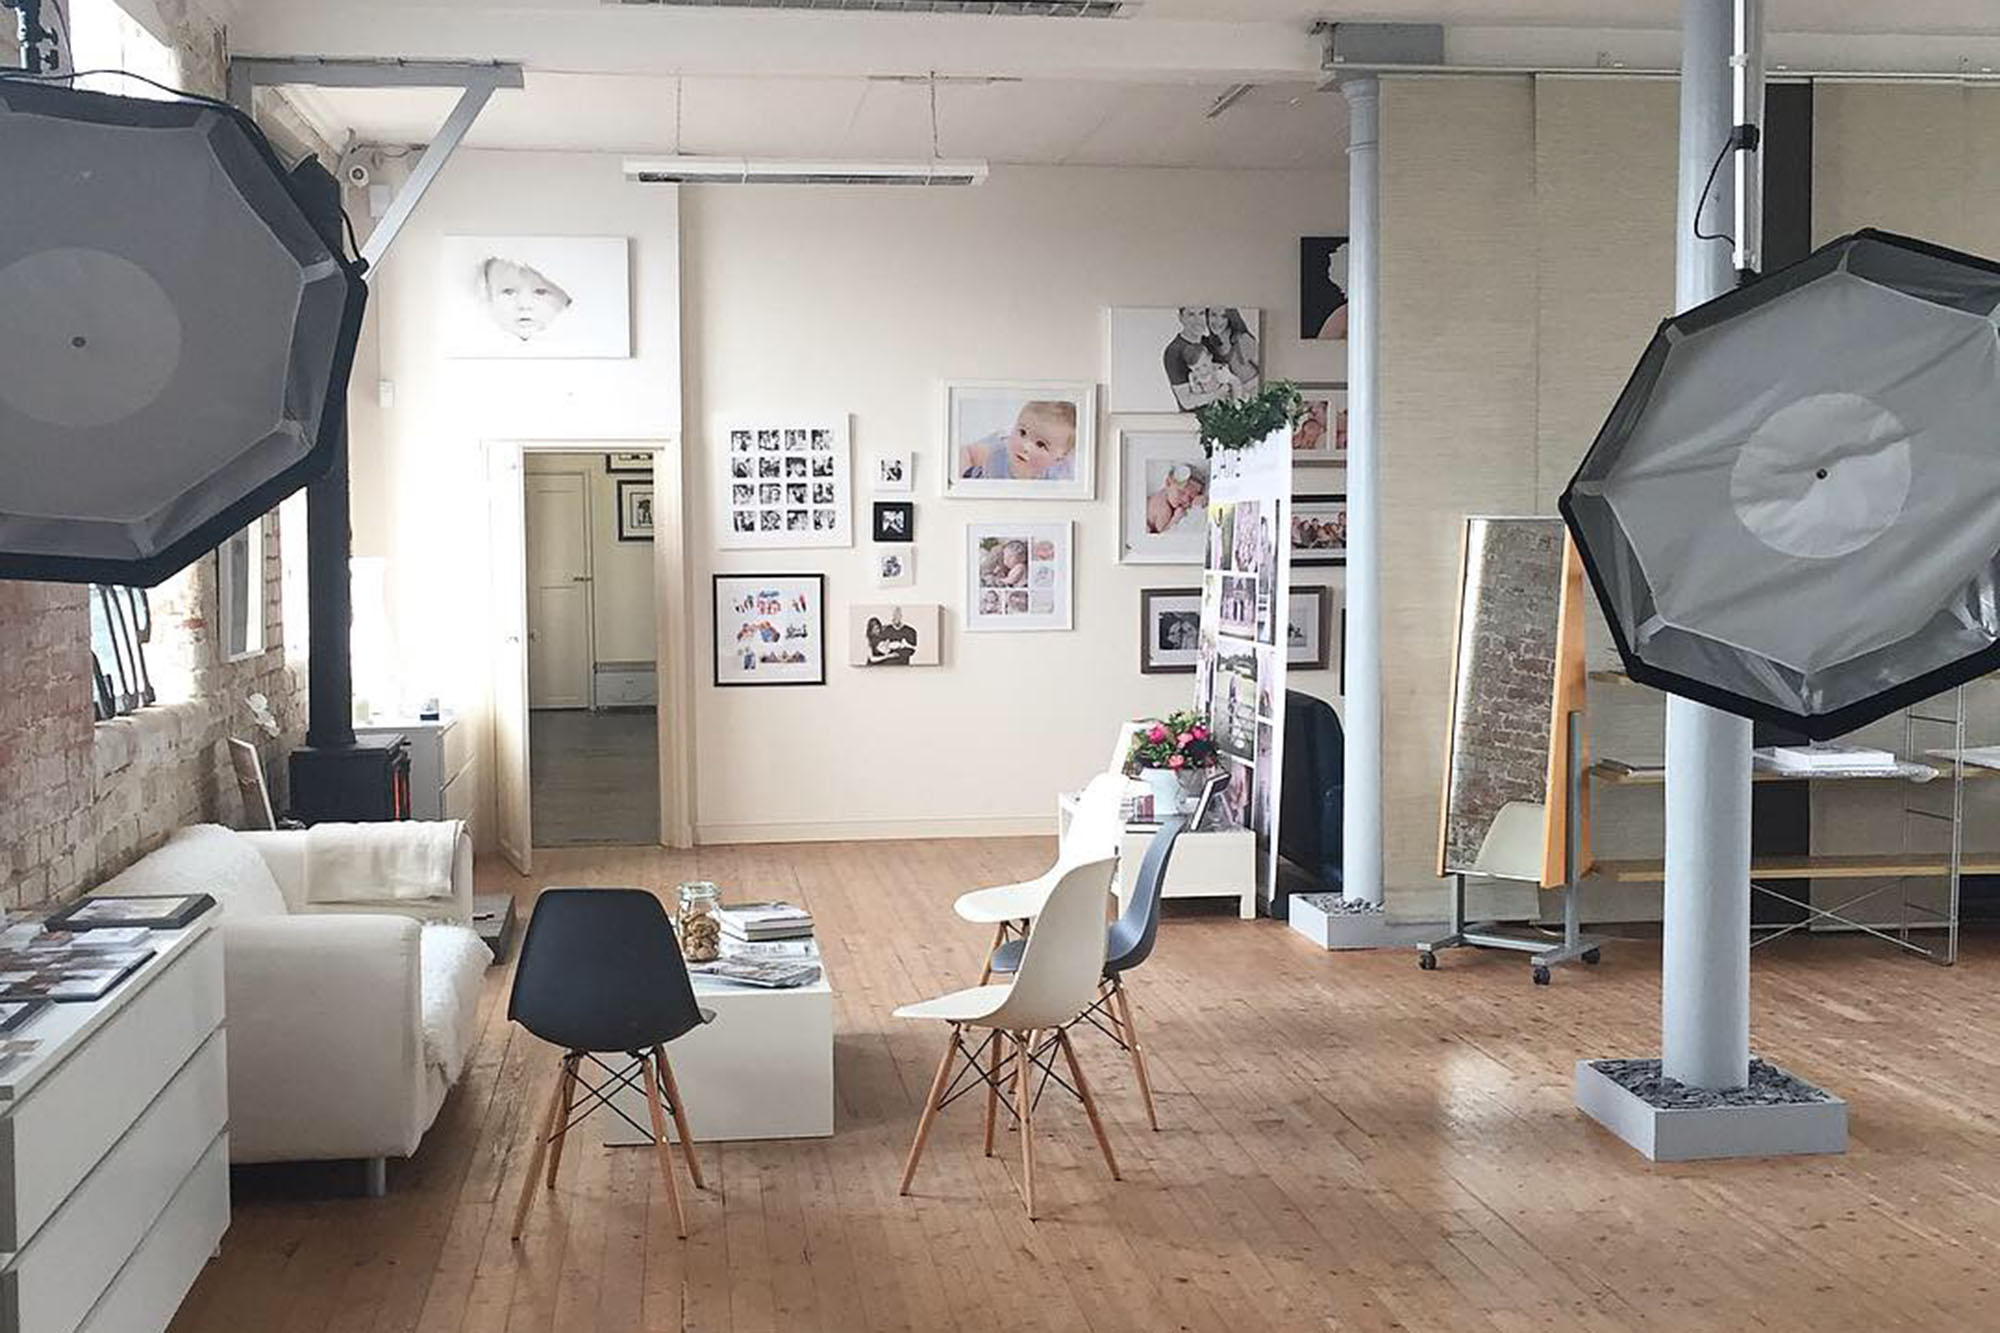 RDP Studio open day